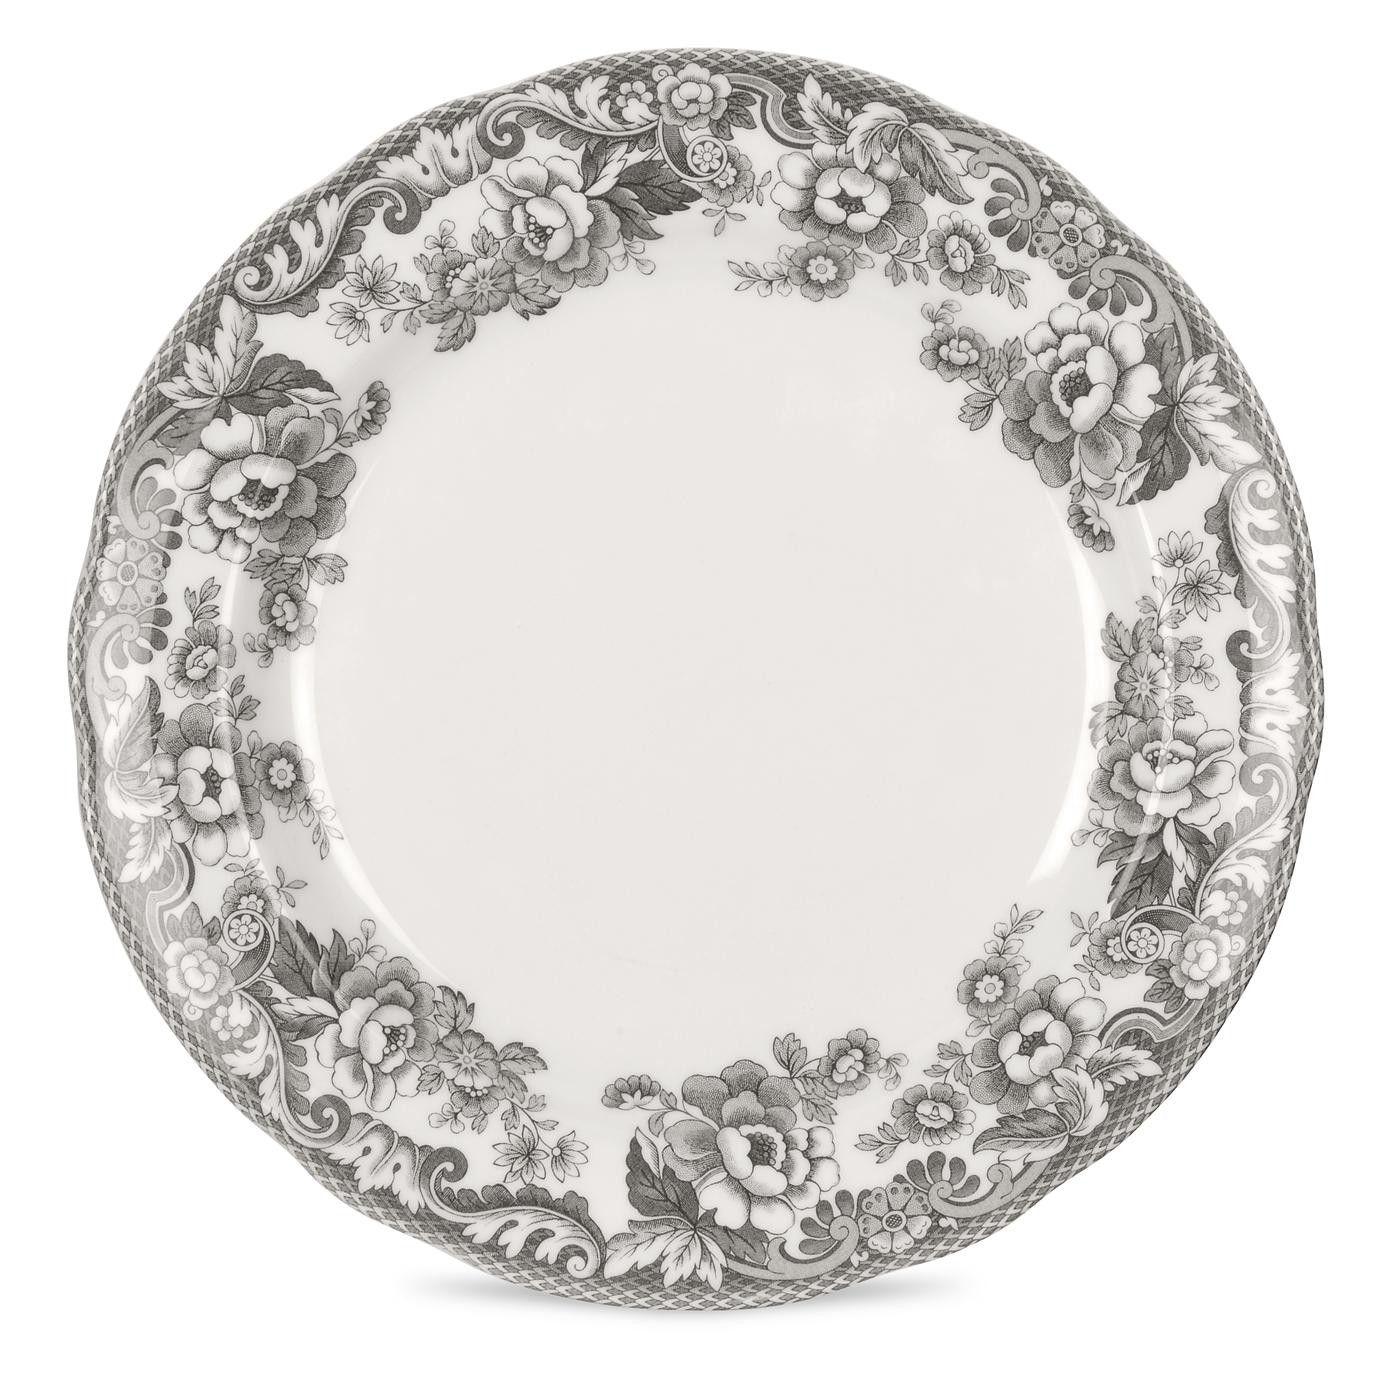 Spode Delamere Rural 10.5 Inch Plate Set of 4 | Dinner ...